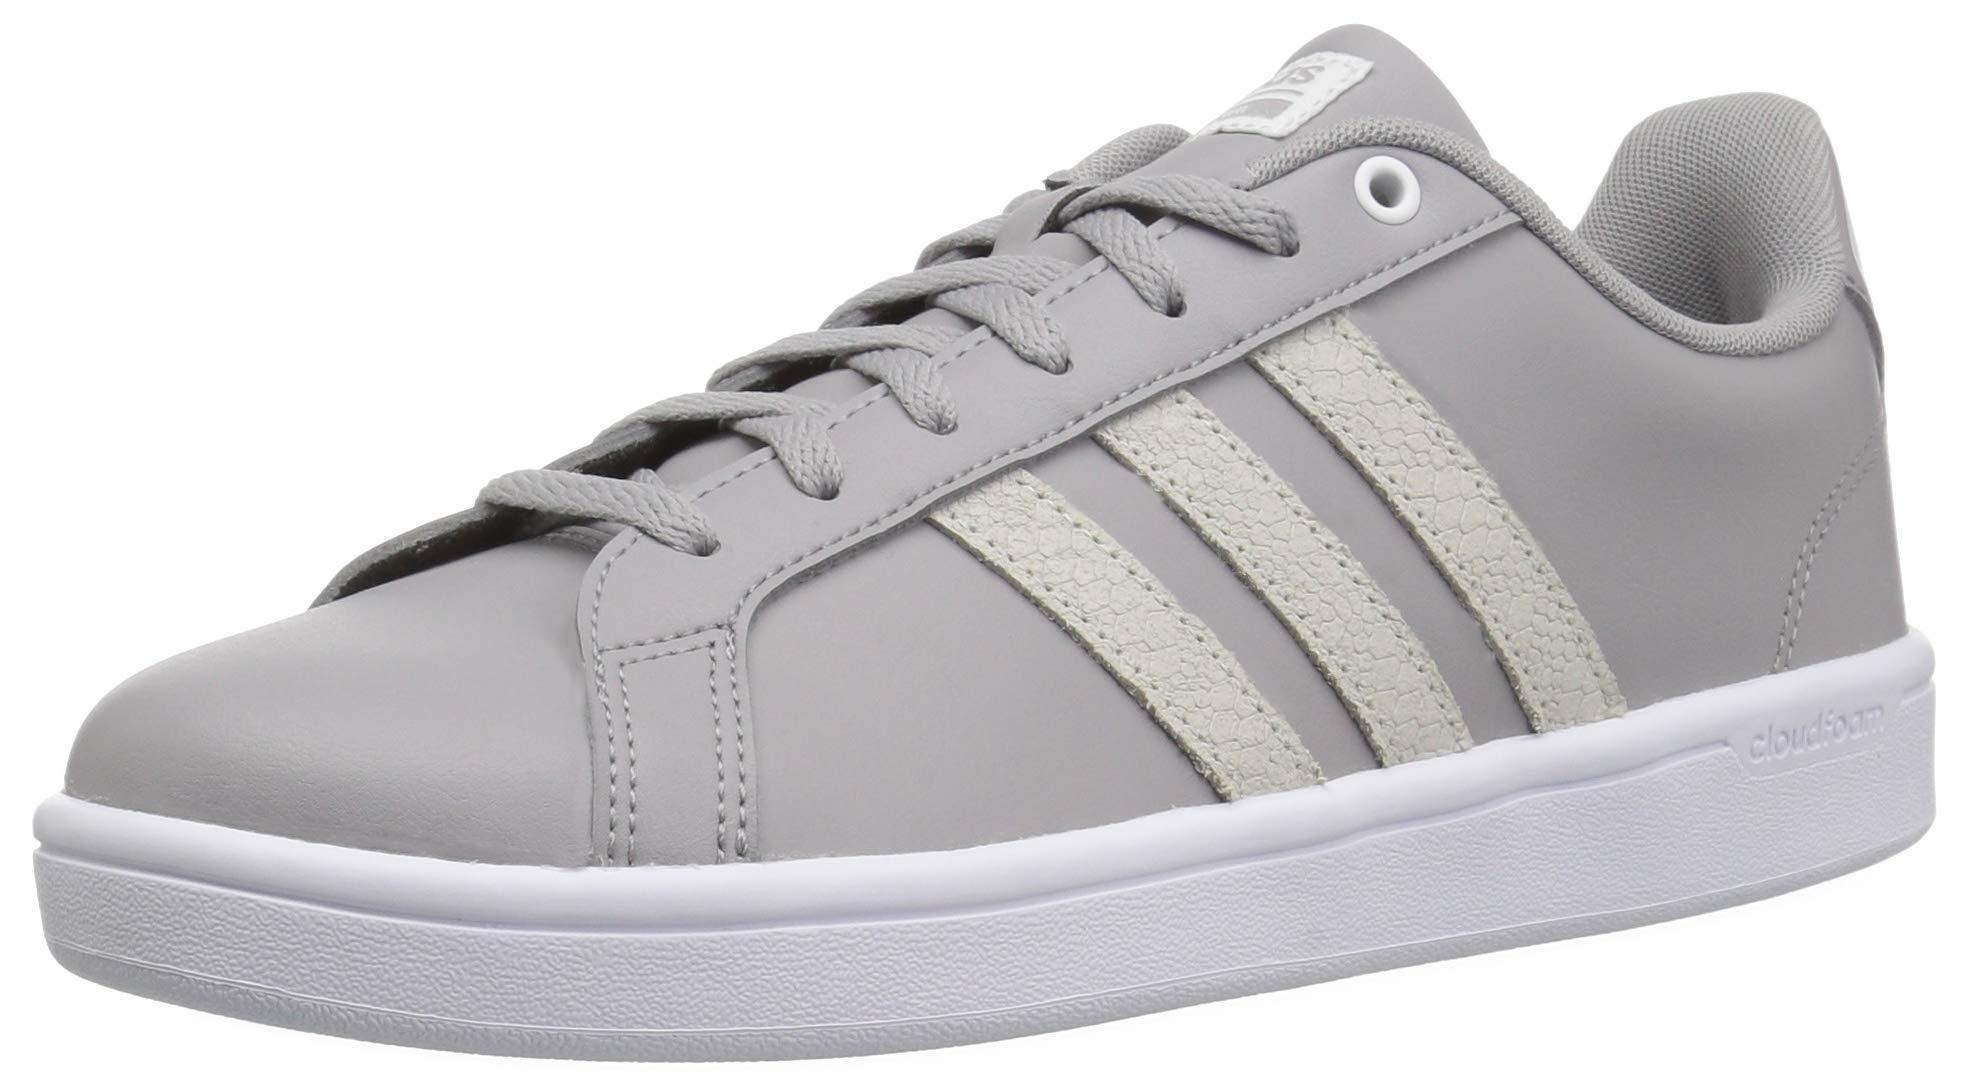 adidas Women's Cf Advantage Sneaker White/Light Granite, 5 M US